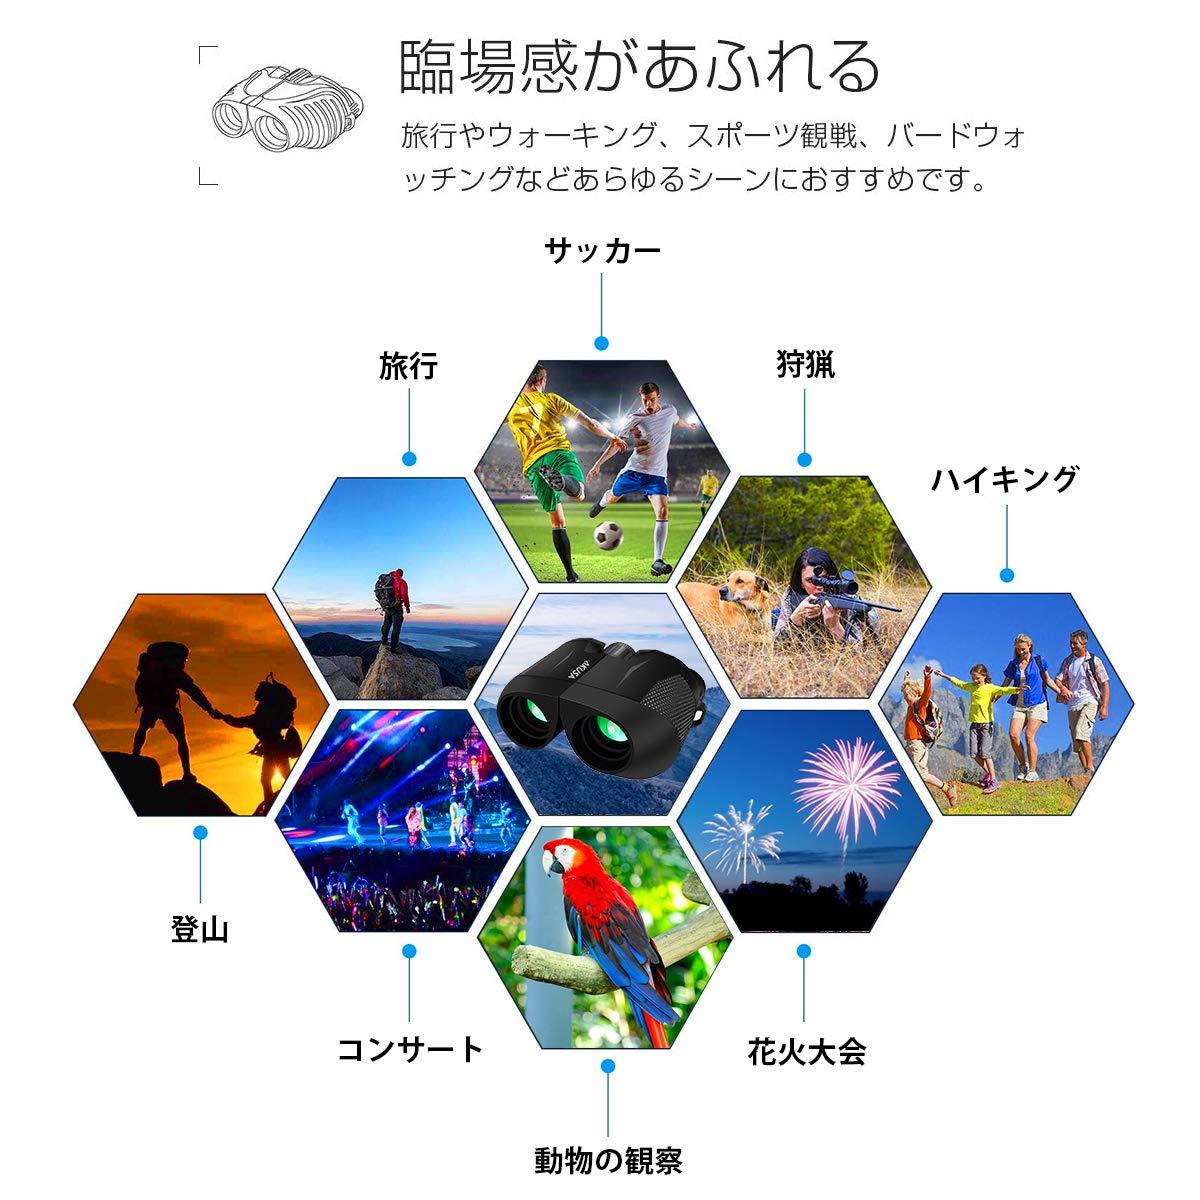 https://images-na.ssl-images-amazon.com/images/I/71SpVHMZsjL._SL1200_.jpg